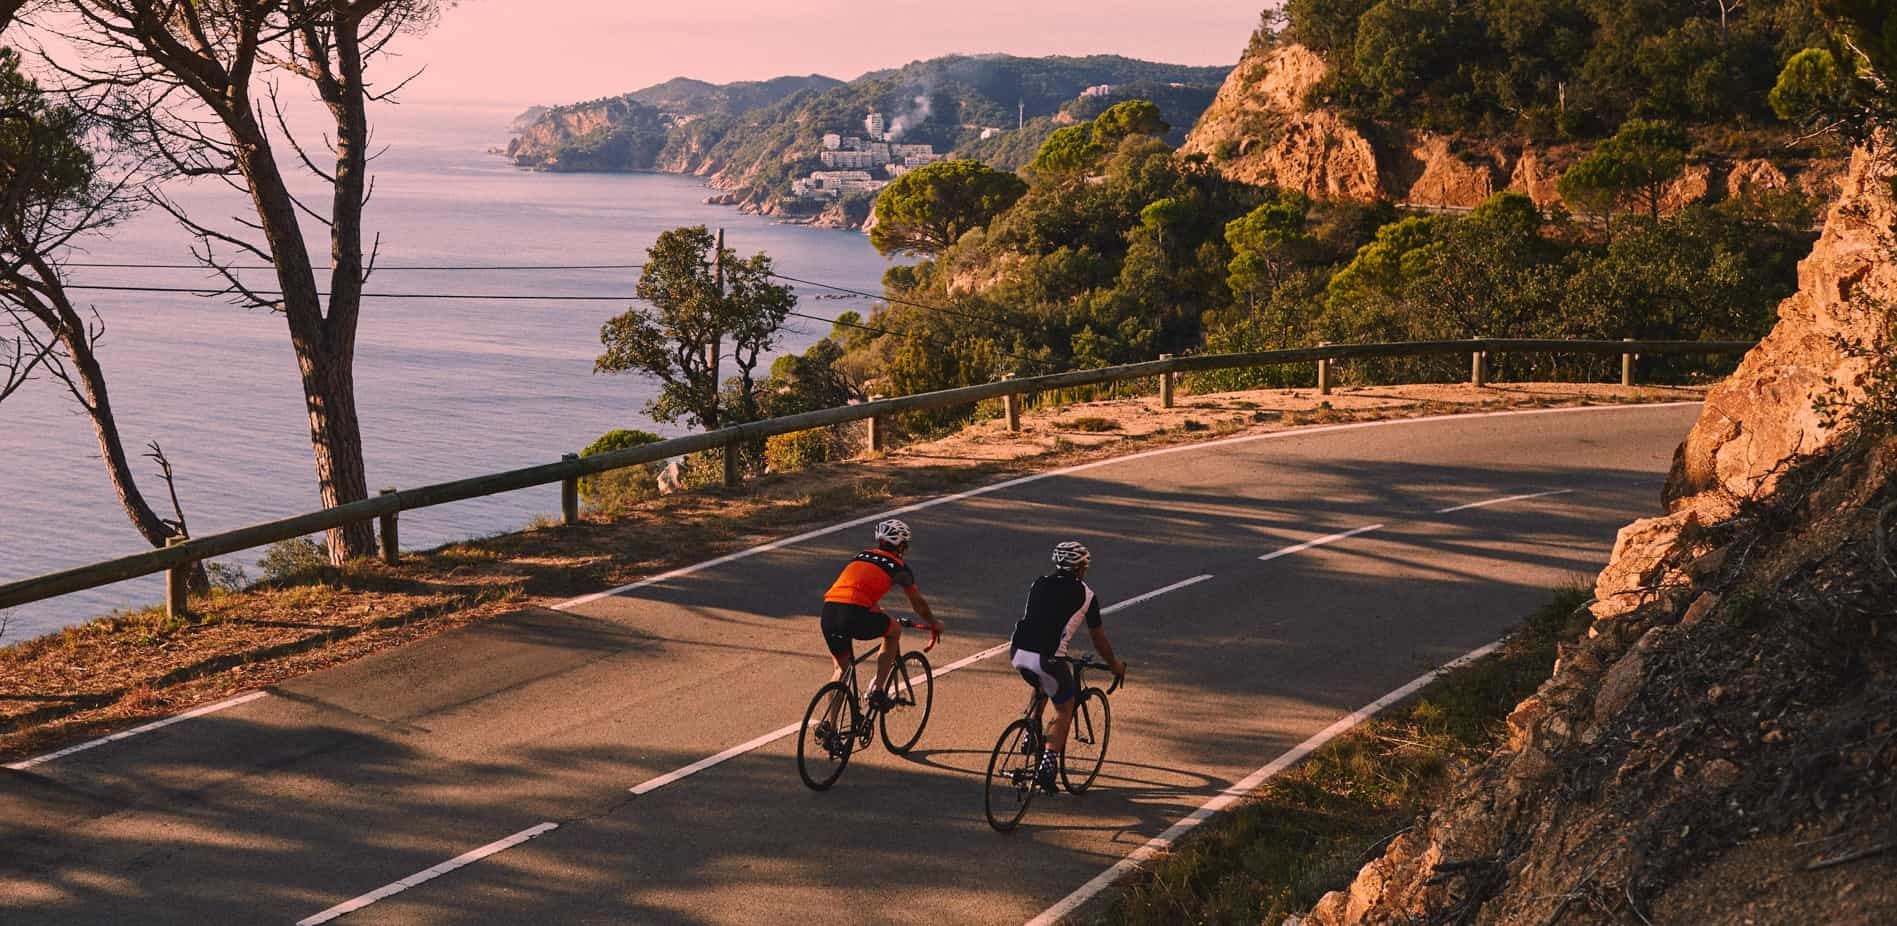 Cycling_Catalonia_Massis_De_Les Gavarres_Bike_Tour